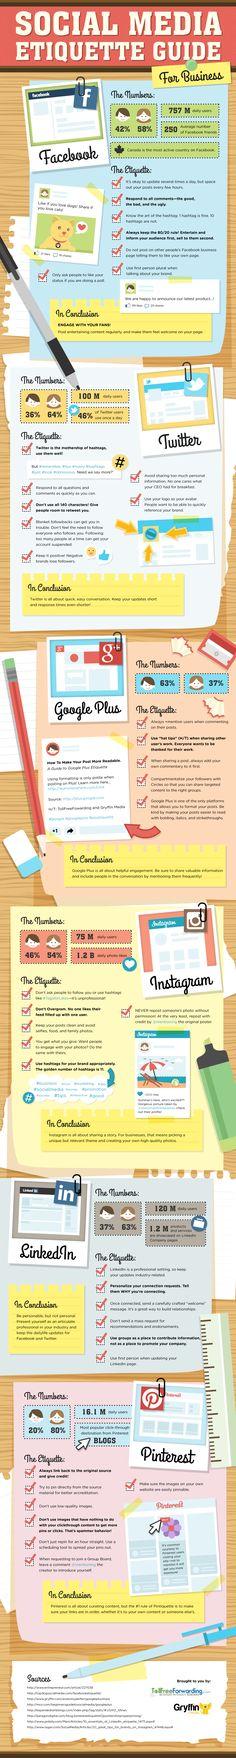 How to mind your manners on social media #infographic #smm #socialmediamarketing #socialmedia #marketing